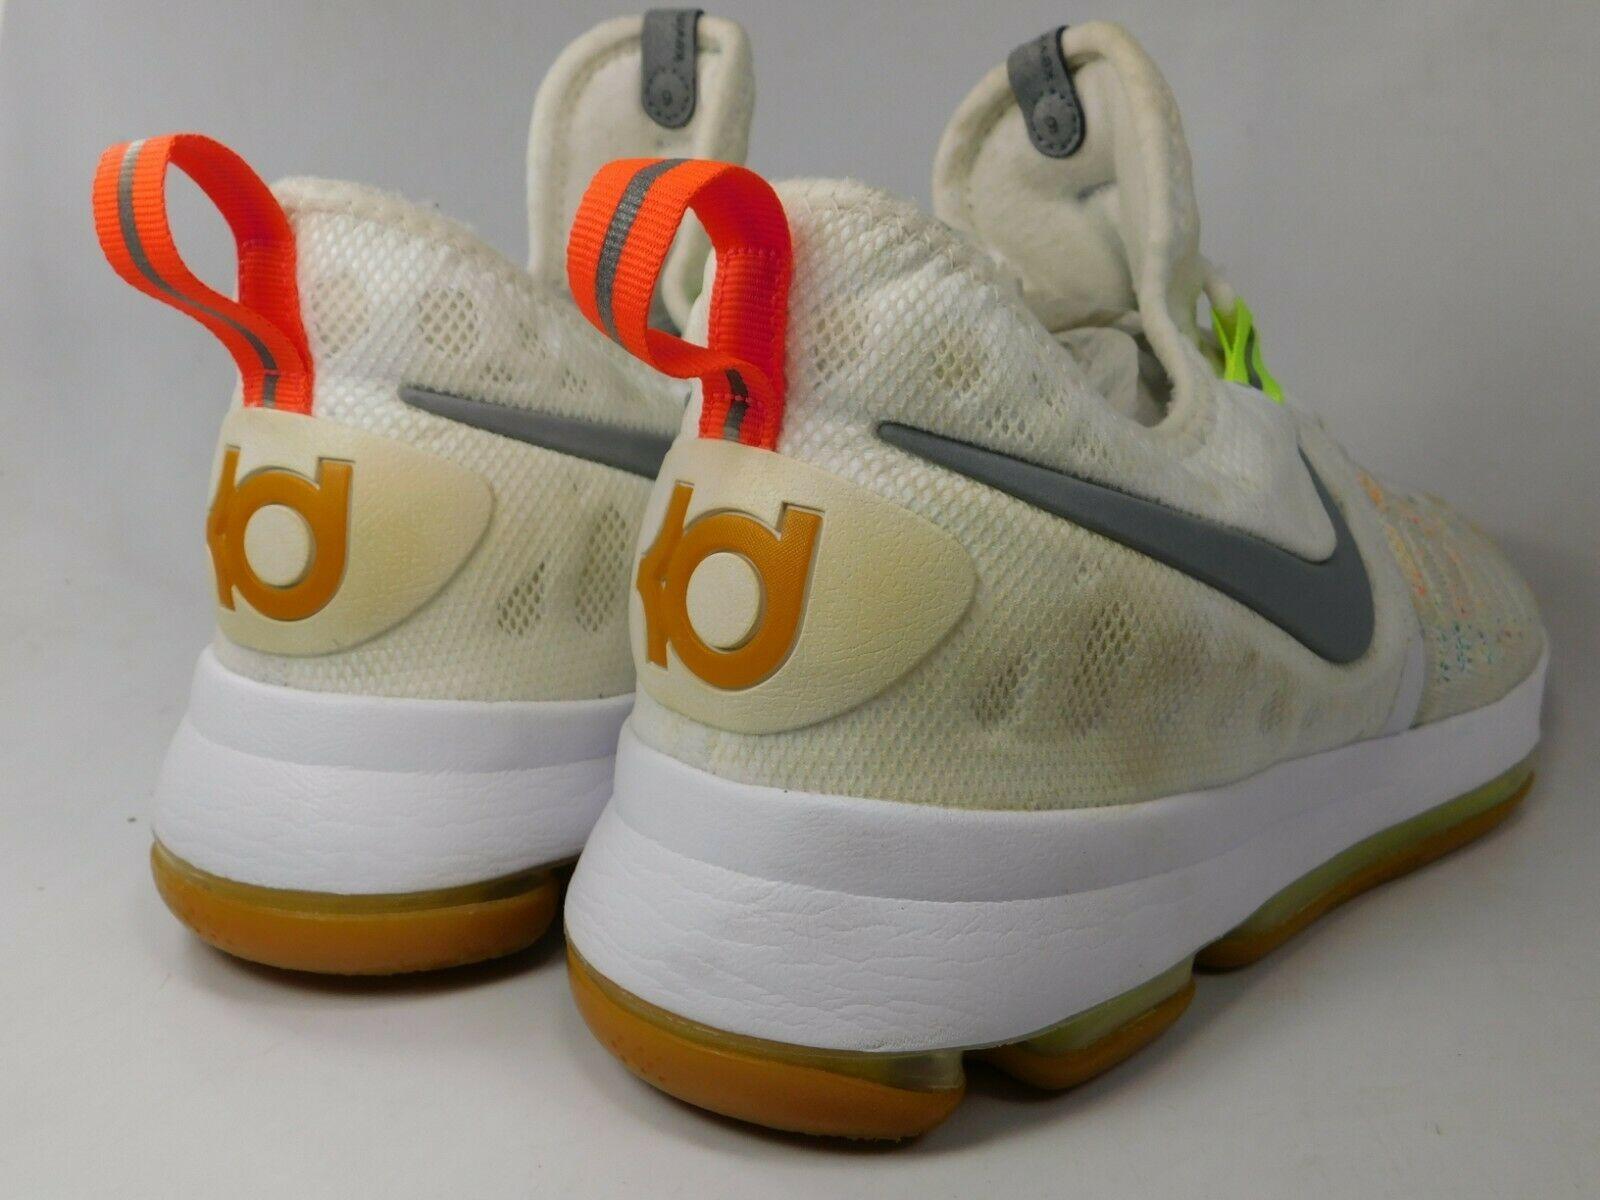 Nike Zoom KD 9 IX Size US 10 M (D) EU 44 Men's Basketball Shoes Multi 843392-900 image 5